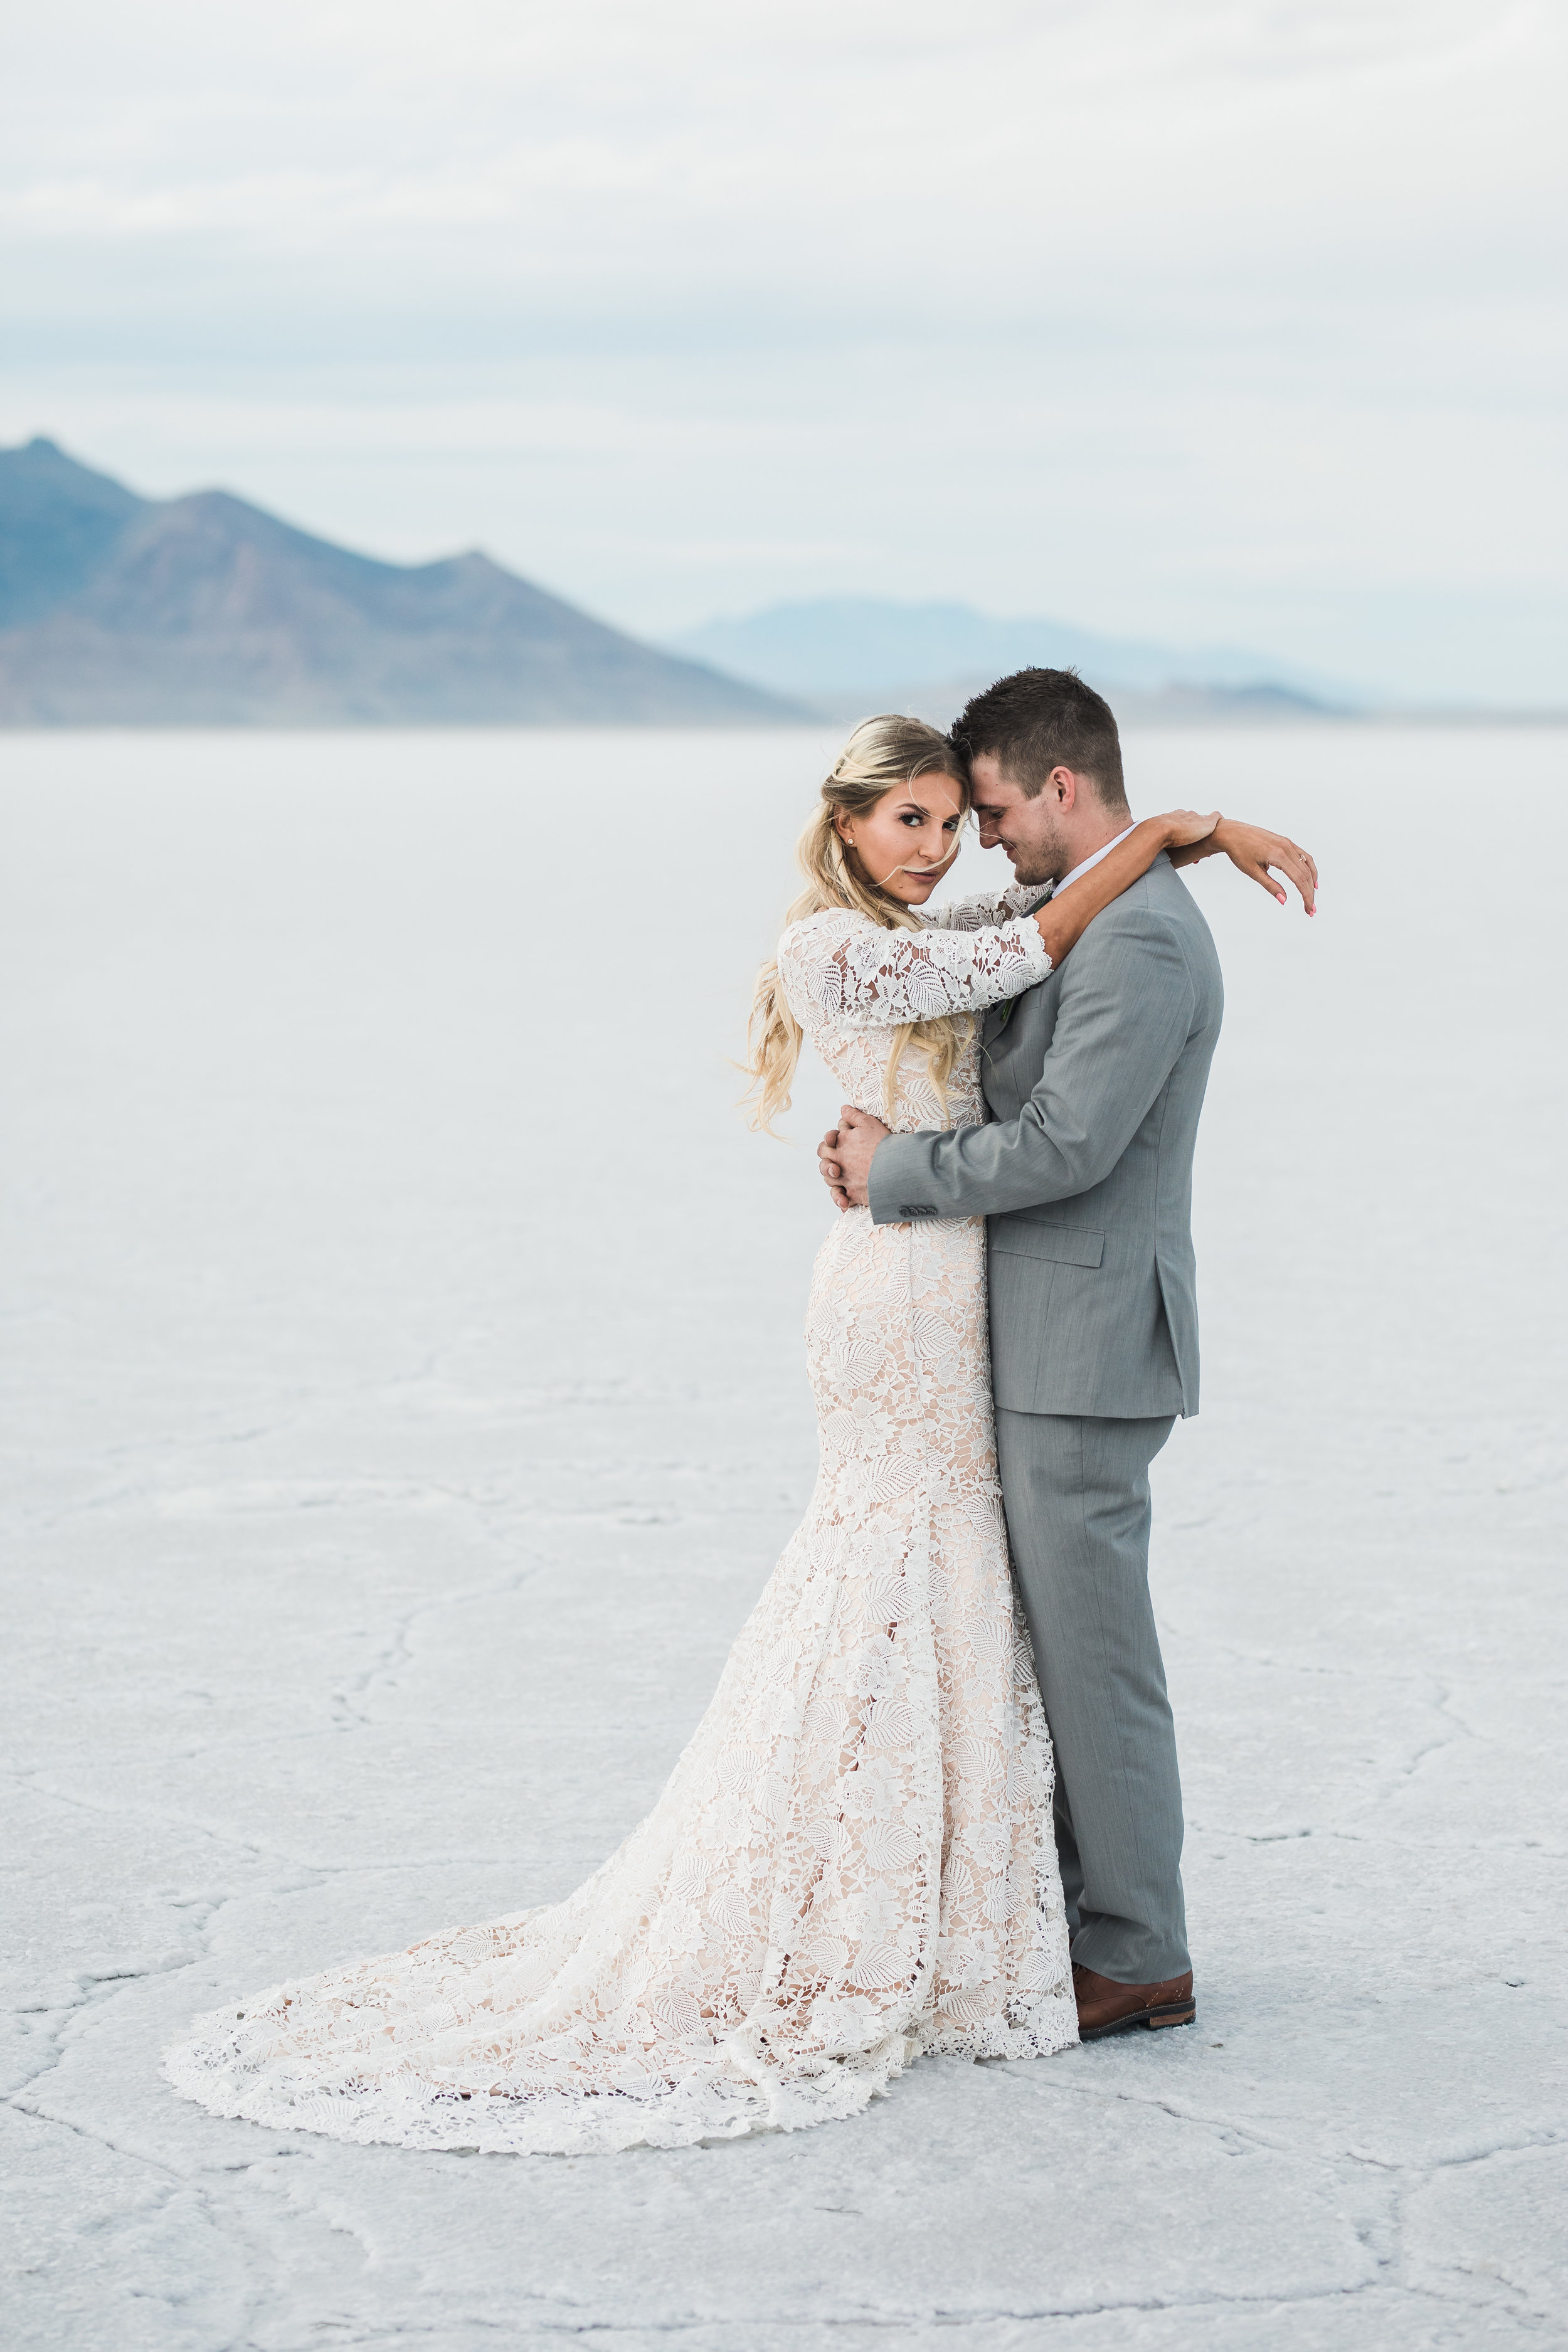 Bonneville salt flats bridals elizabeth cooper wedding dress